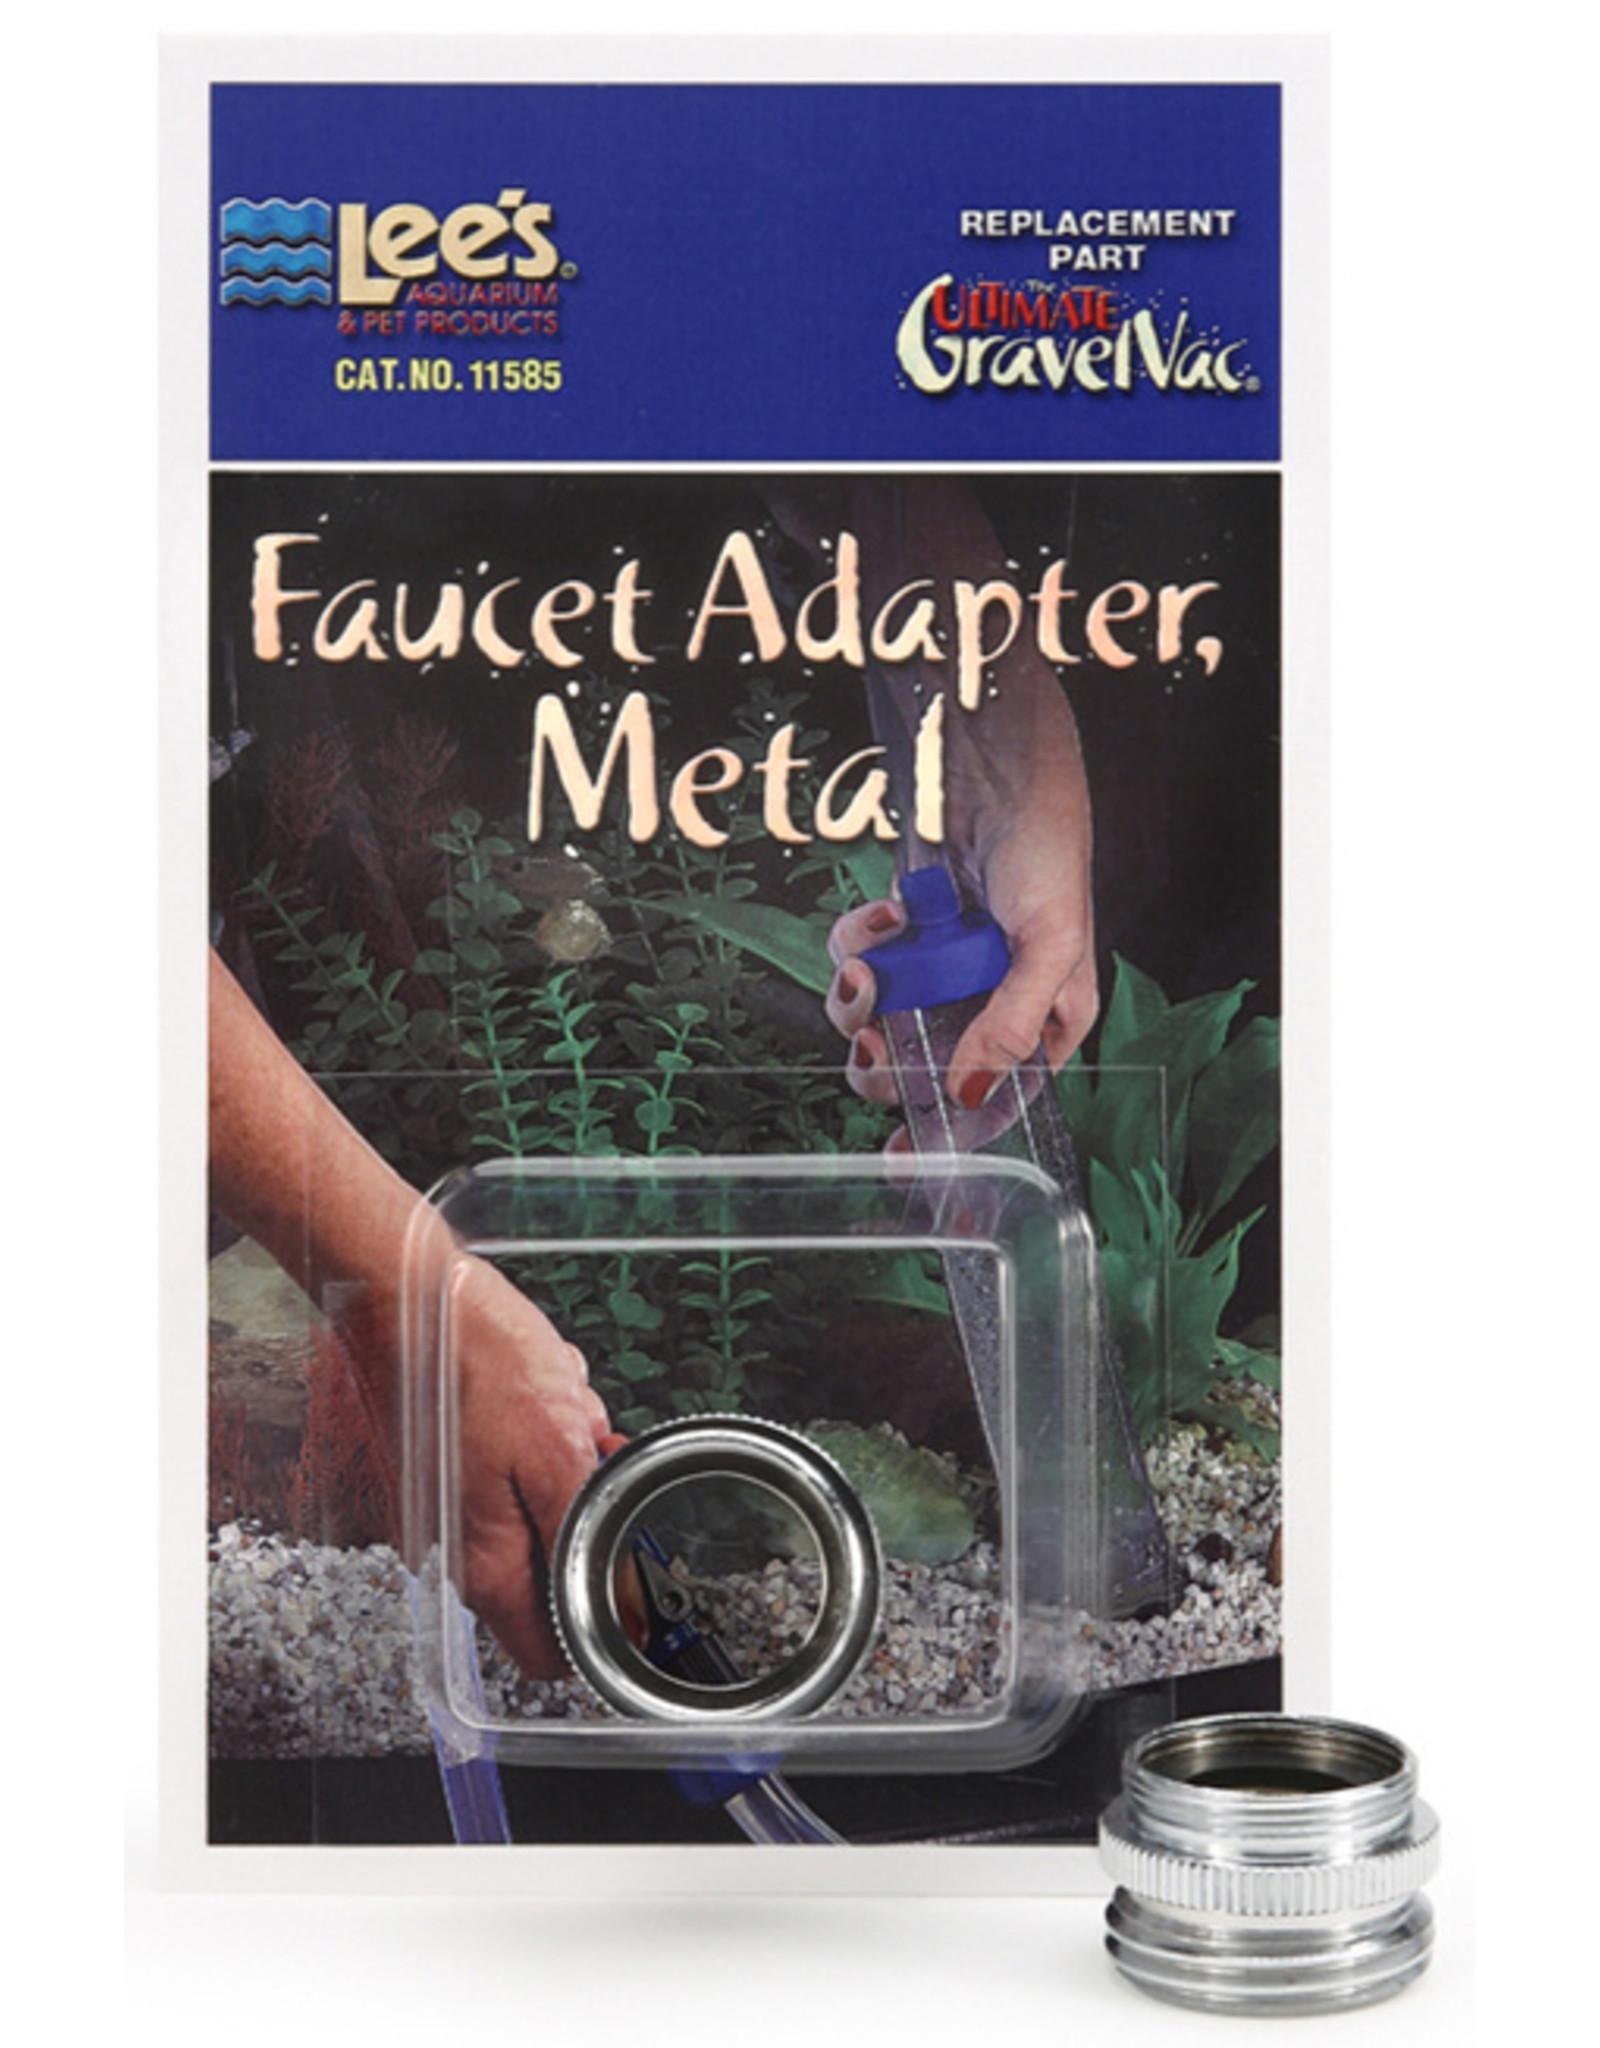 Lee's LEE'S Faucet adapter metal